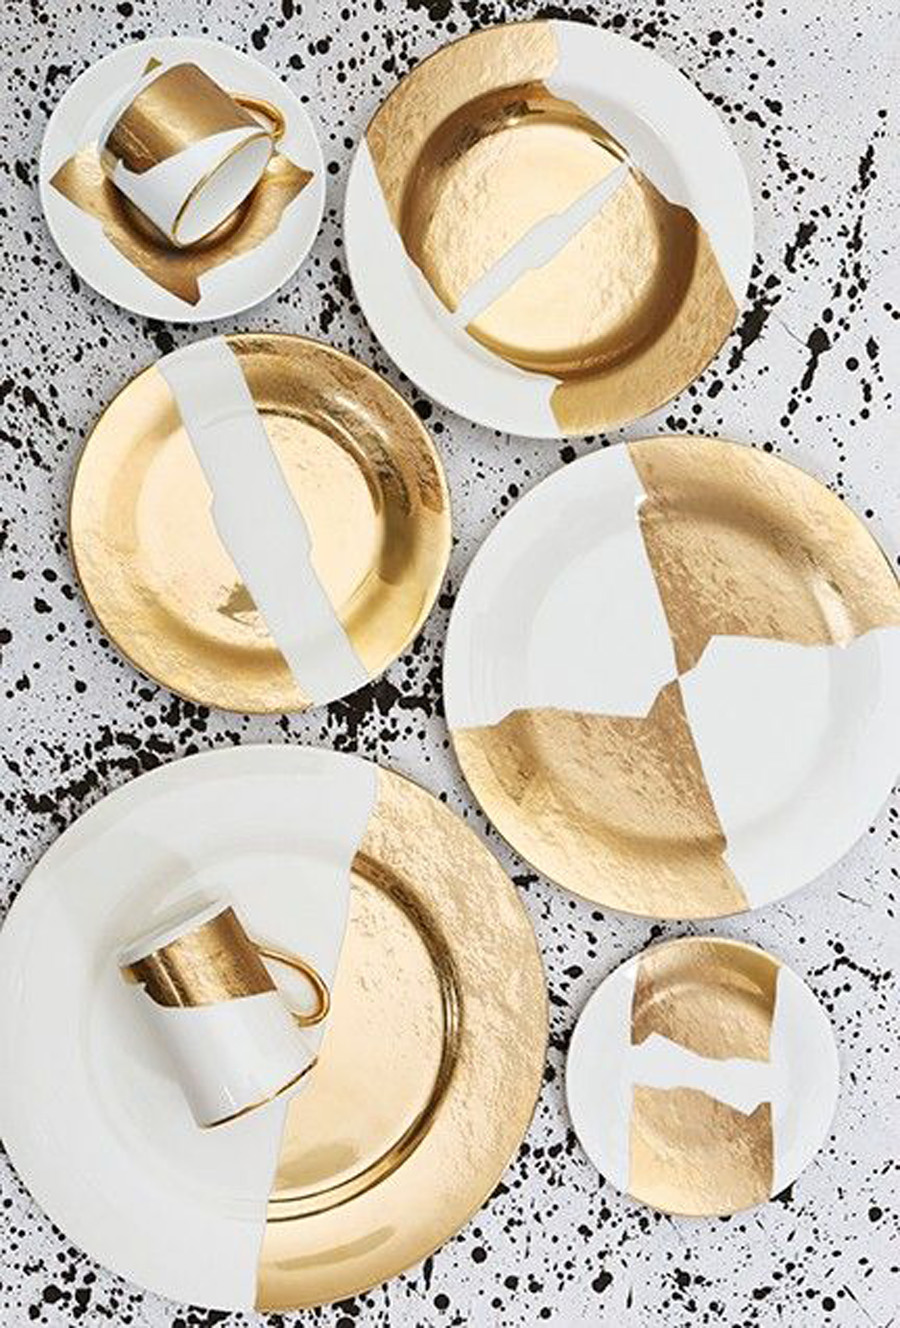 Pickard China by celebrity interior designer Kelly Wearstler